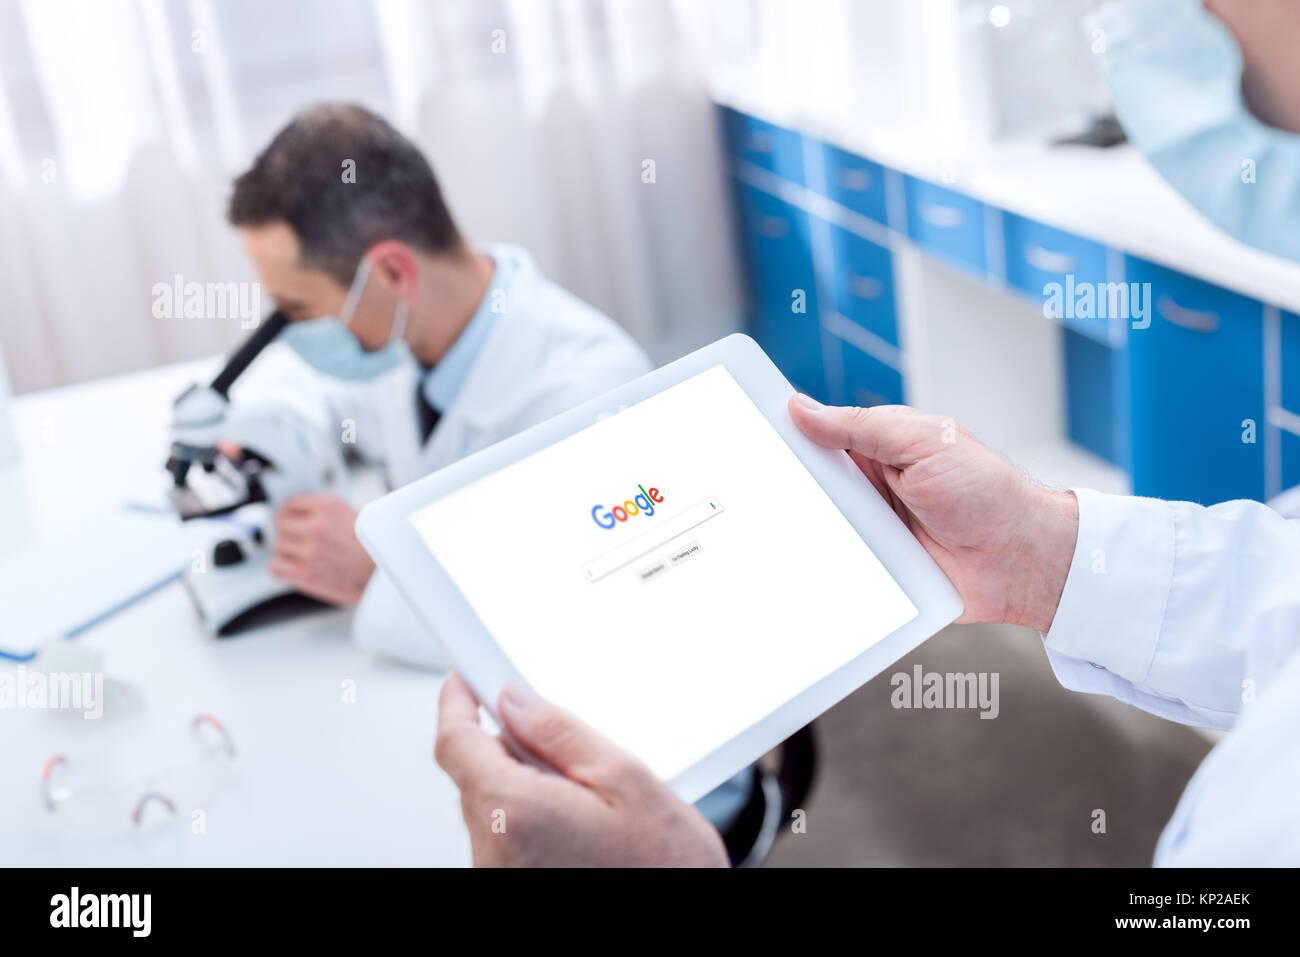 Scientist holding digital tablet - Stock Image